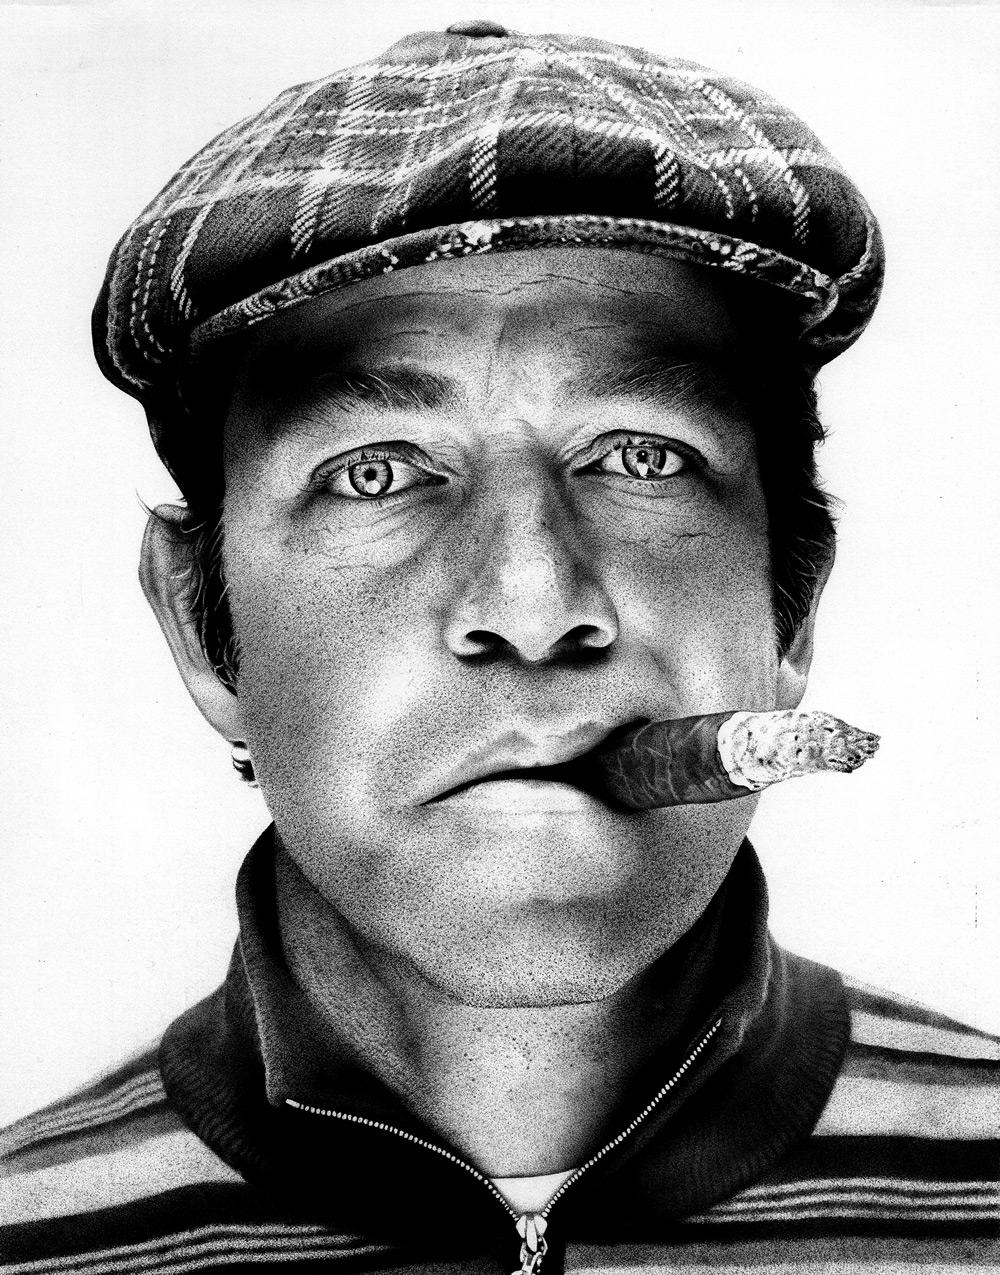 Image of: Portrait Portrait With Pen Artist Paul Kobrigers Hyperrealistic Drawings Havoc Tv Havoc Tv Portrait With Pen Artist Paul Kobrigers Hyperrealistic